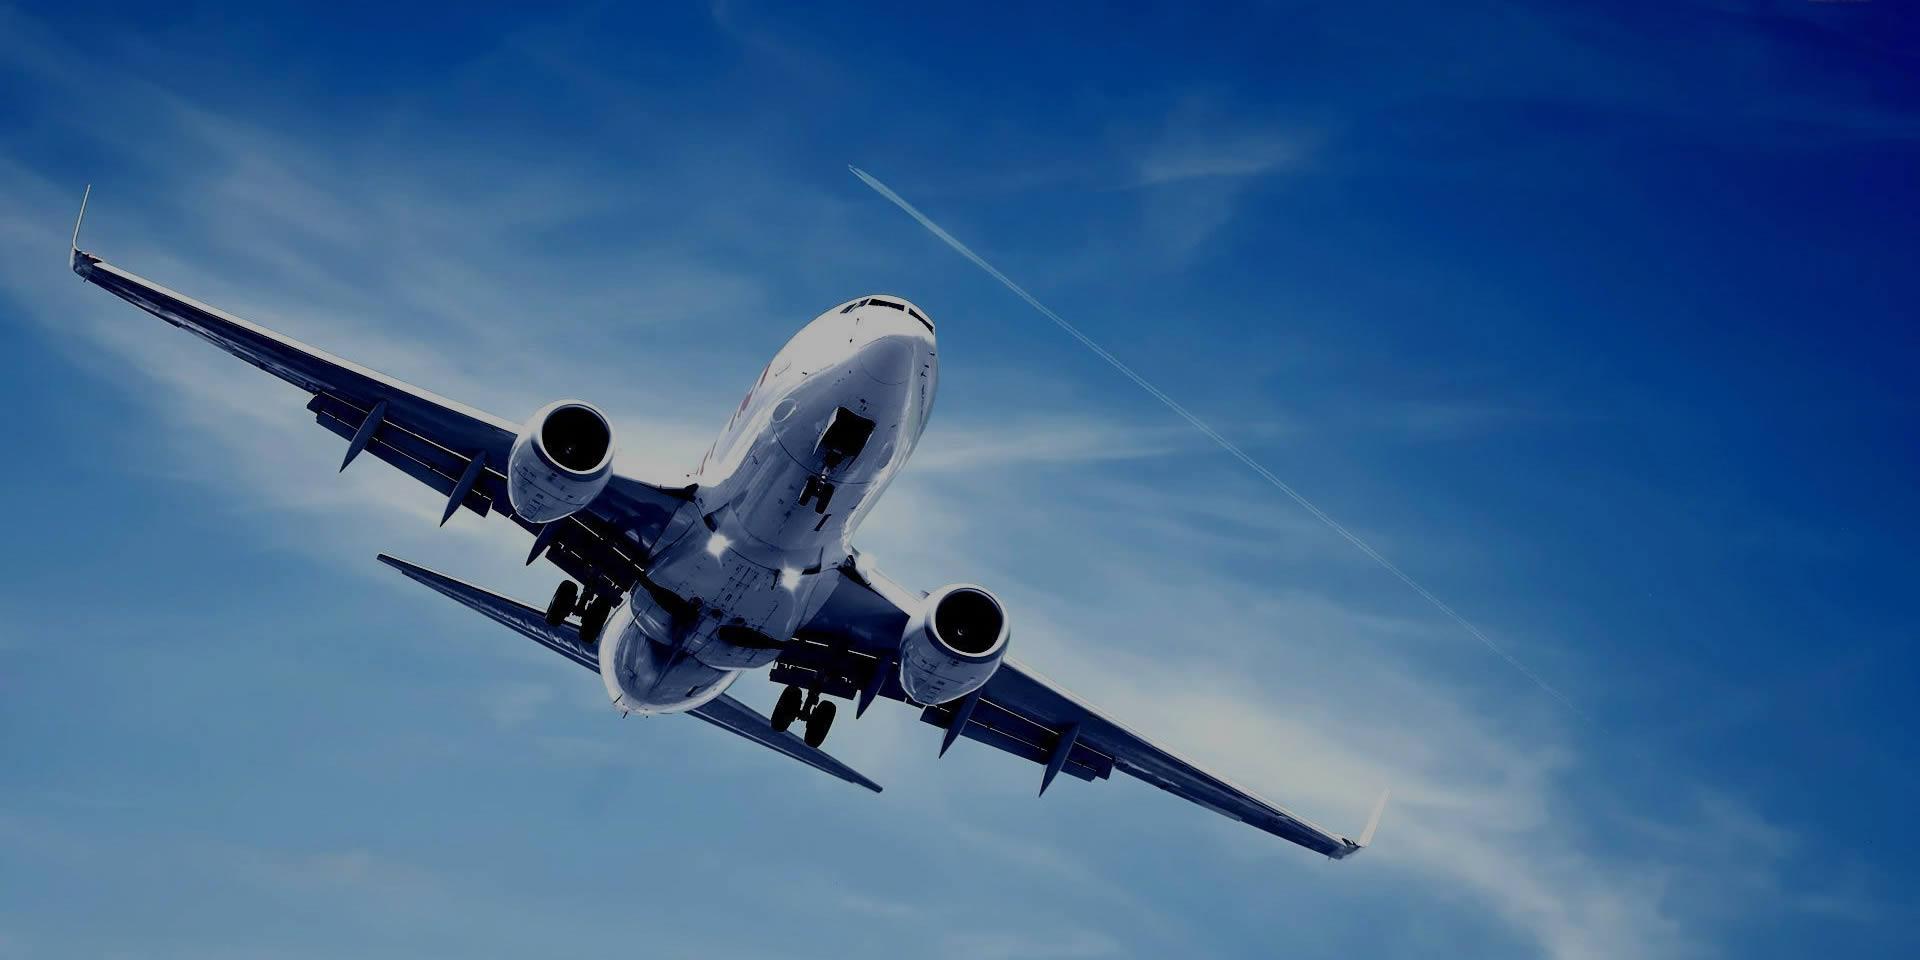 Avio beocontrol